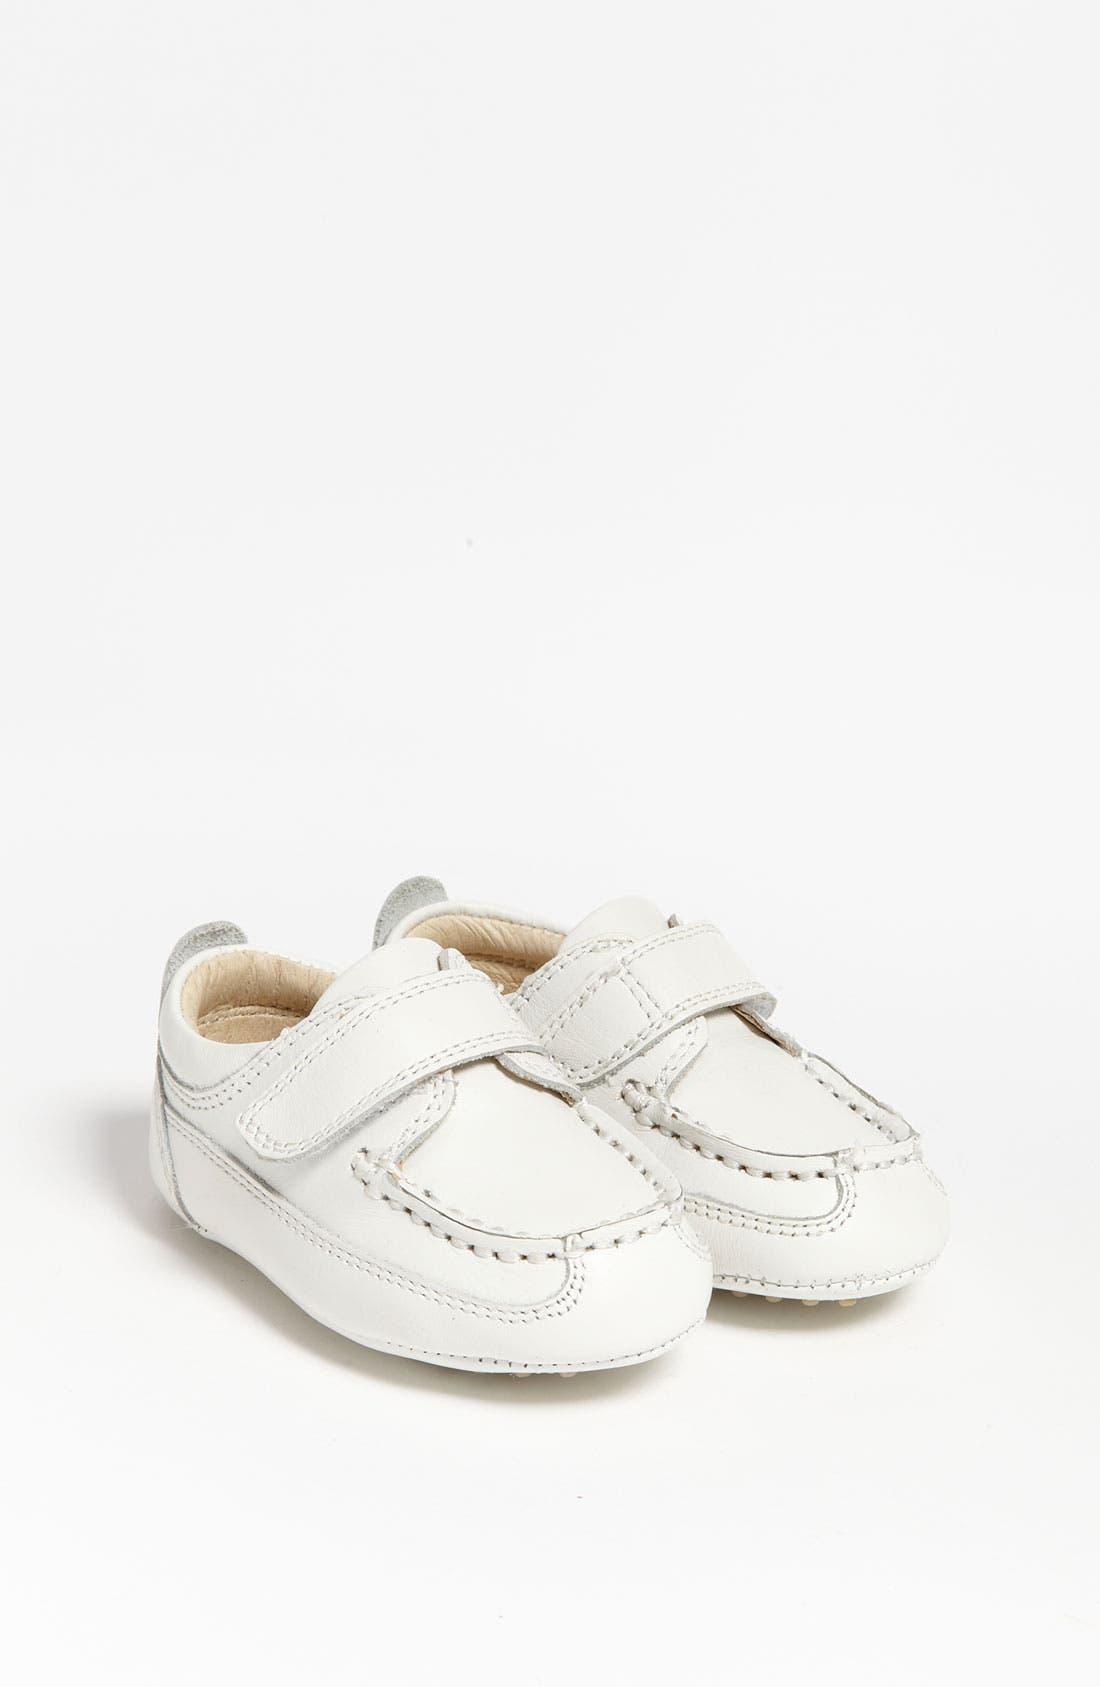 'Mini Johnny' Shoe, Main, color, 100